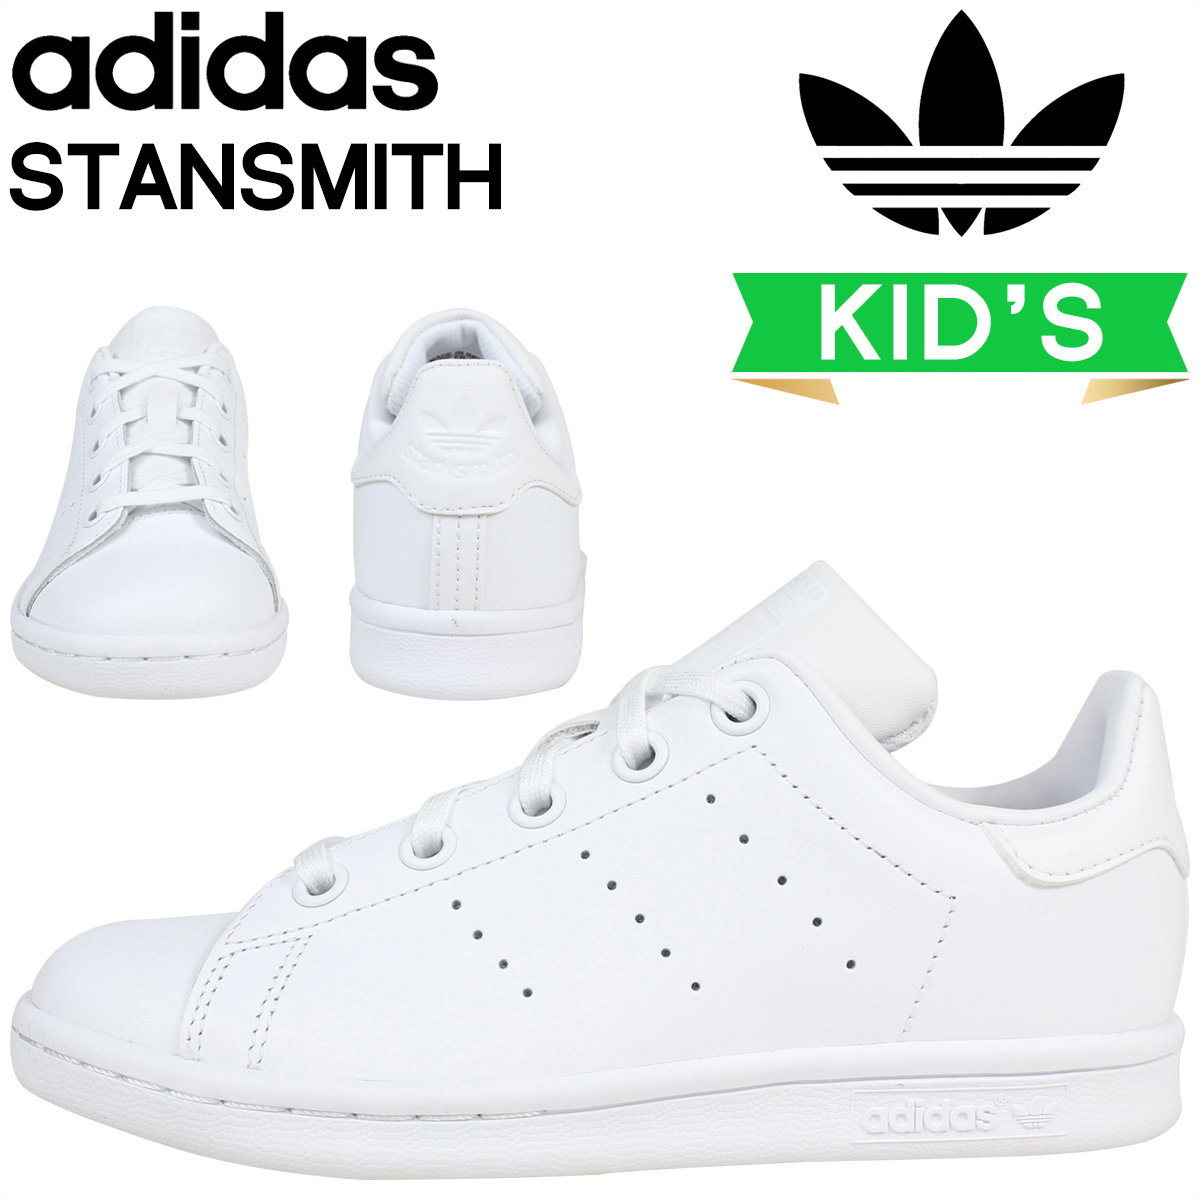 adidas stan smith c